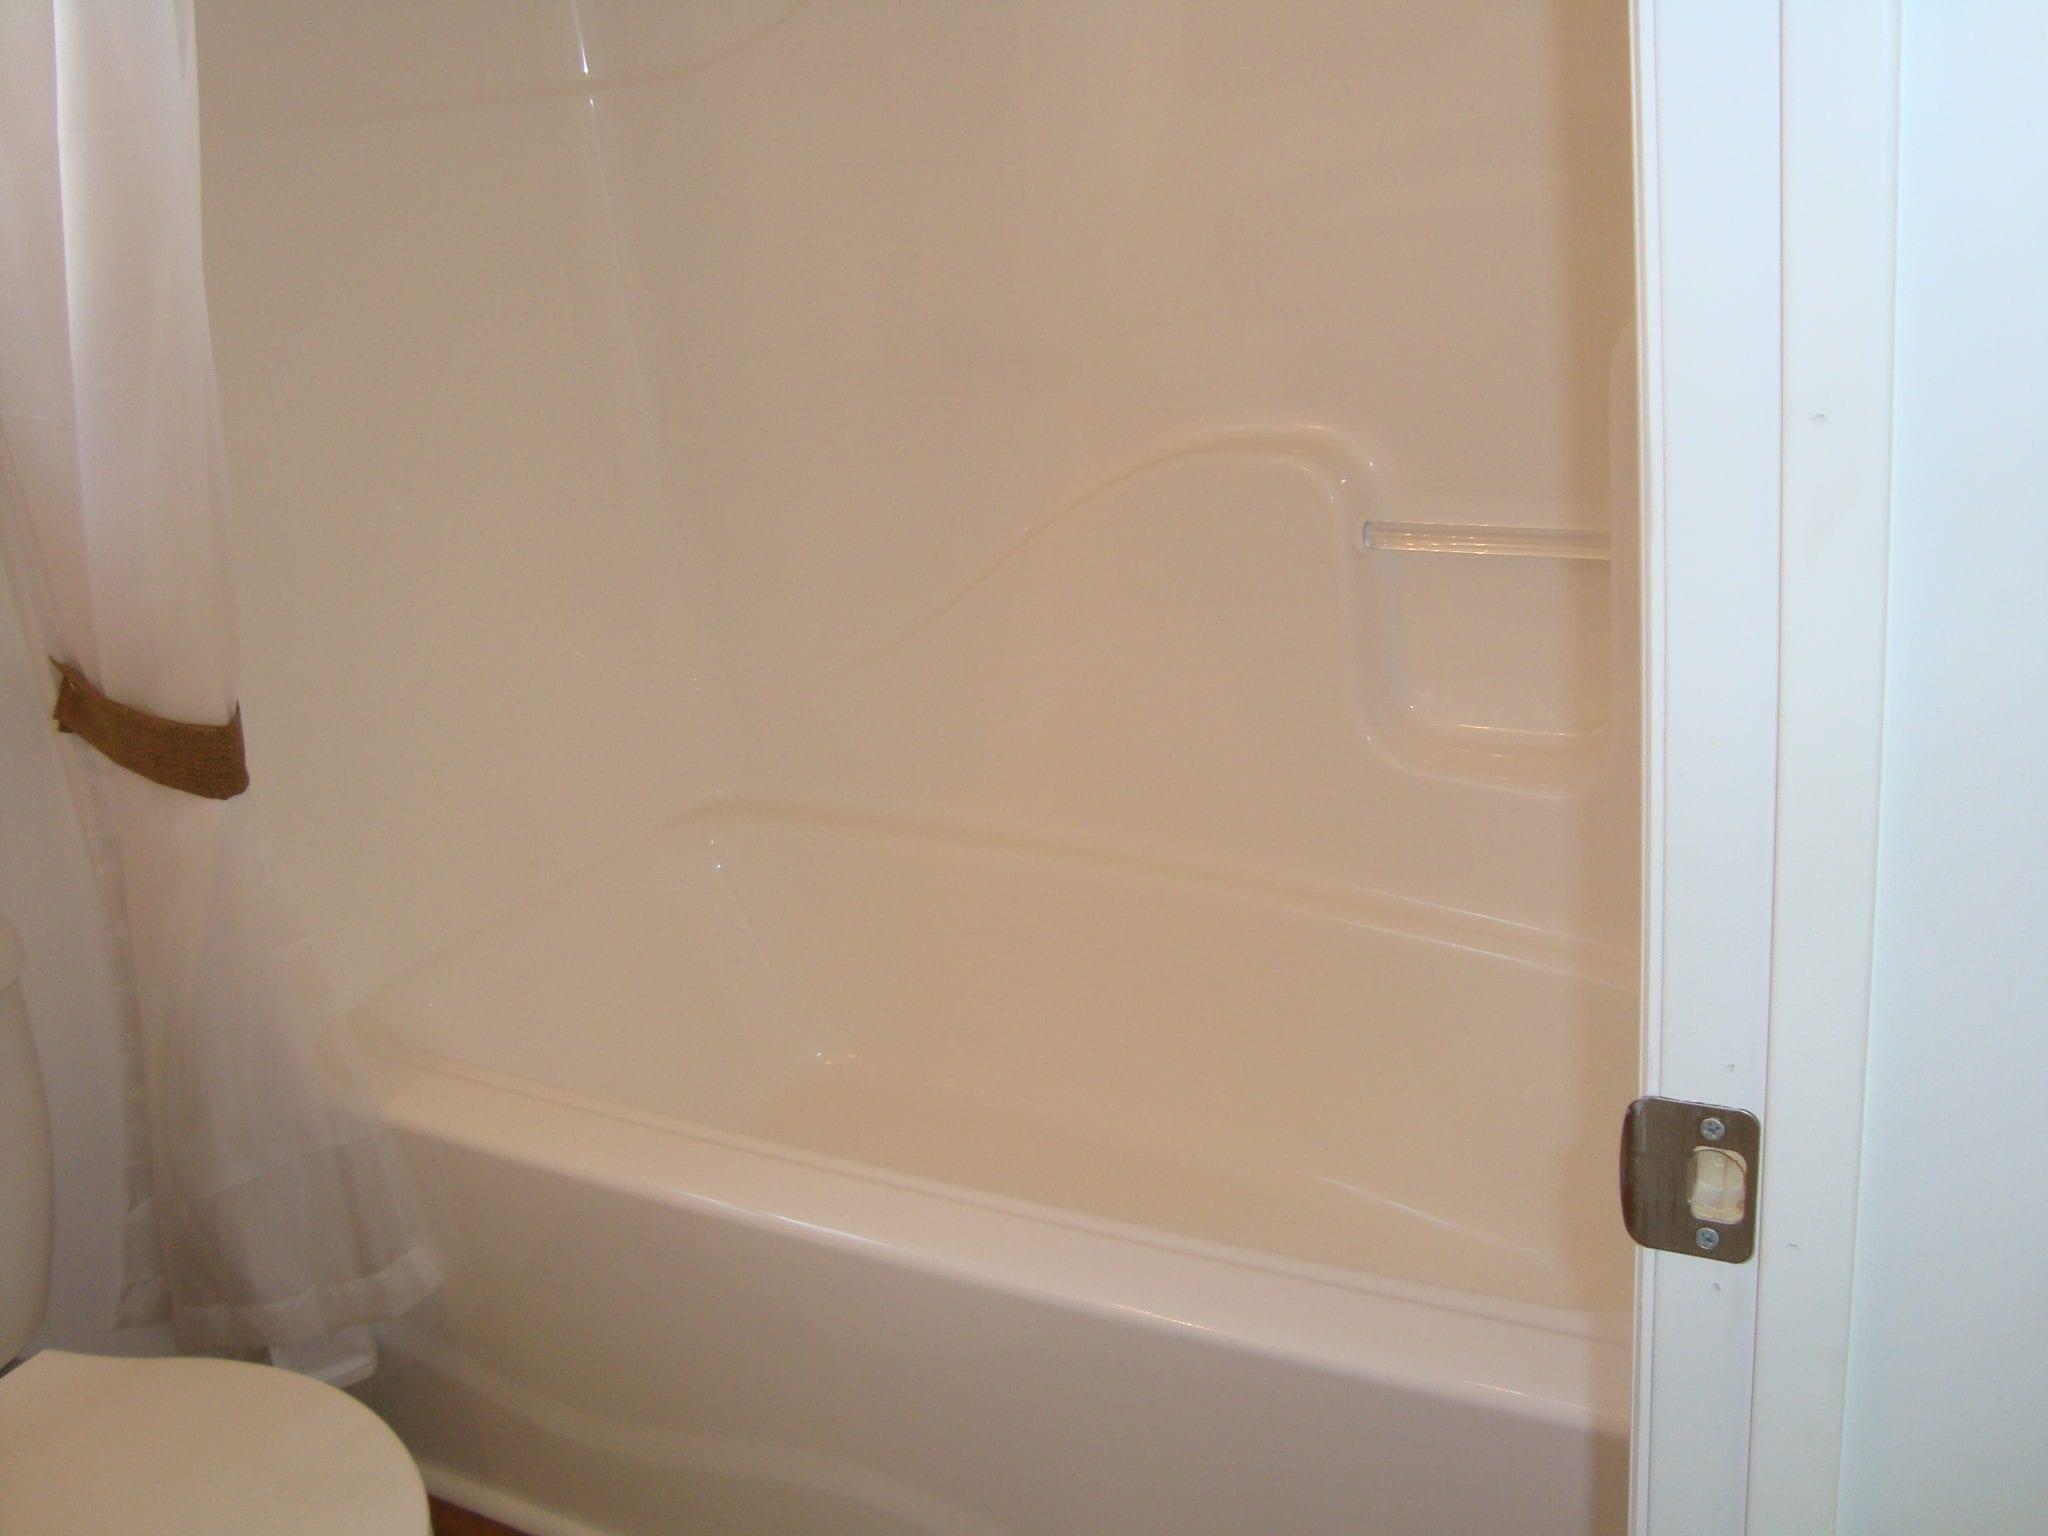 One Piece Fiberglass Tub Shower - Home Design - Zeri.us